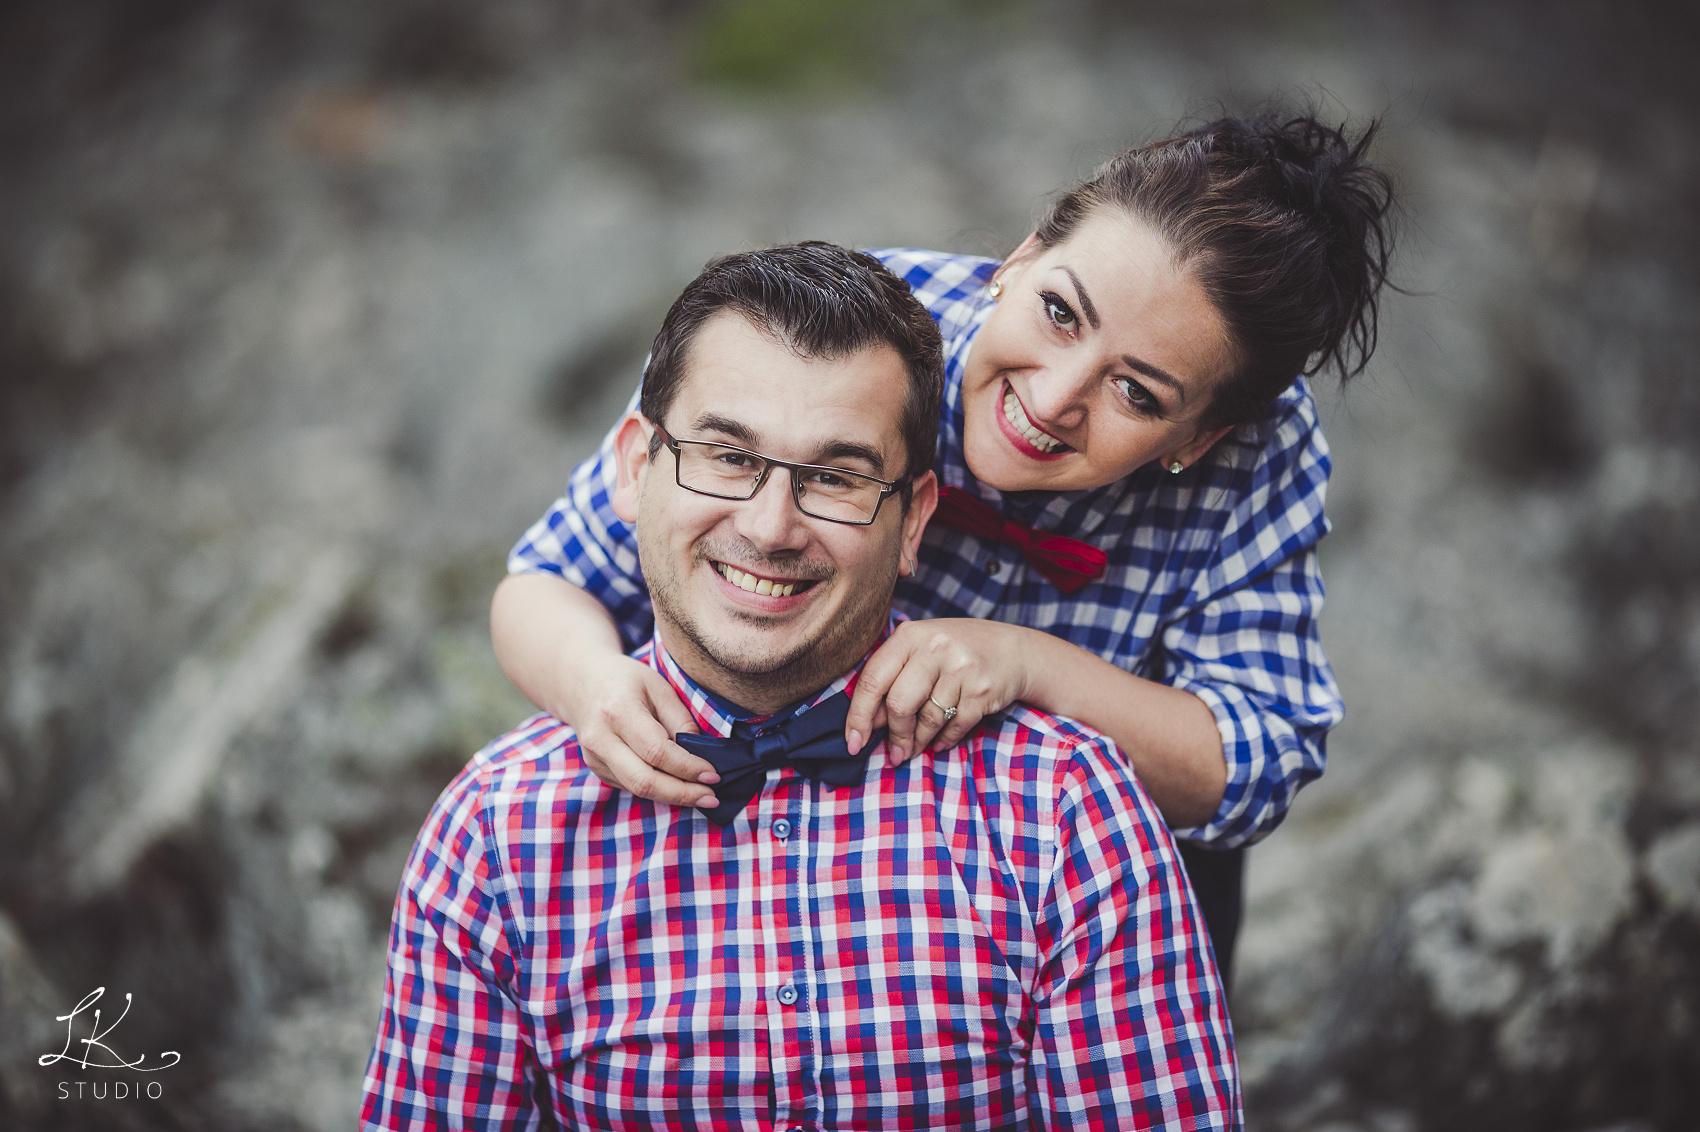 Danielka and Luboš